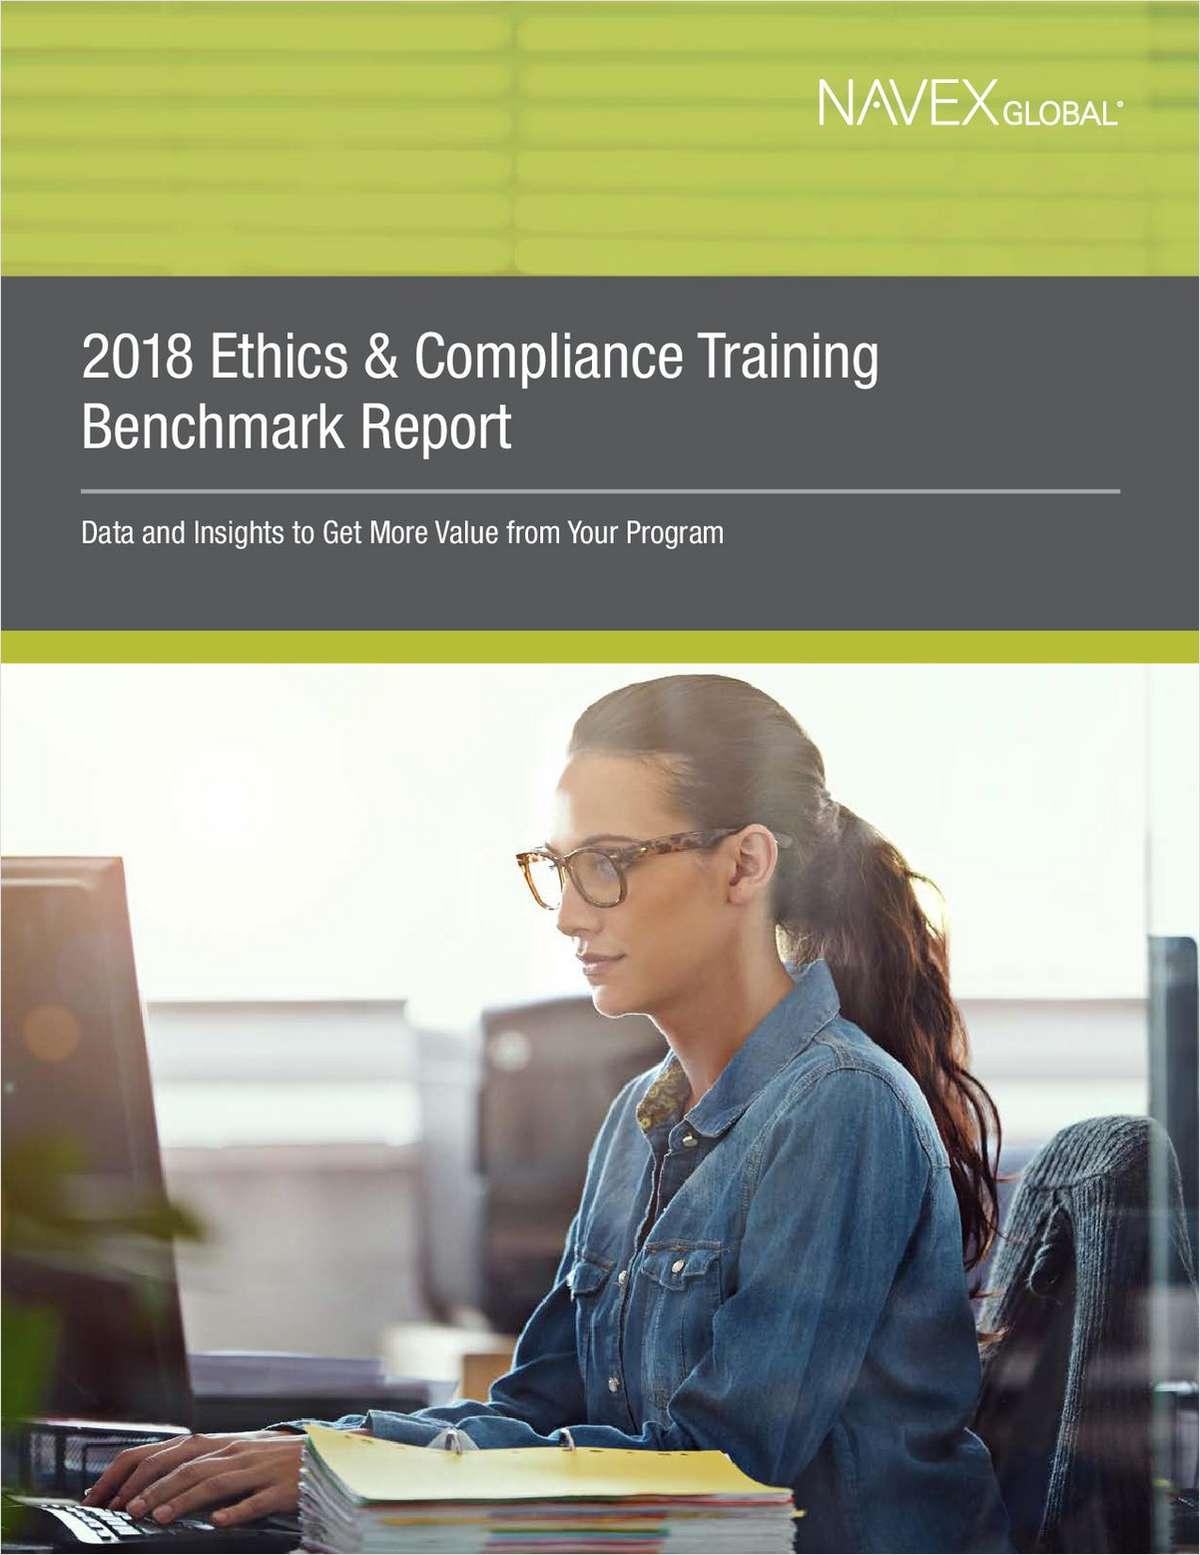 2018 Ethics & Compliance Training Benchmark Report